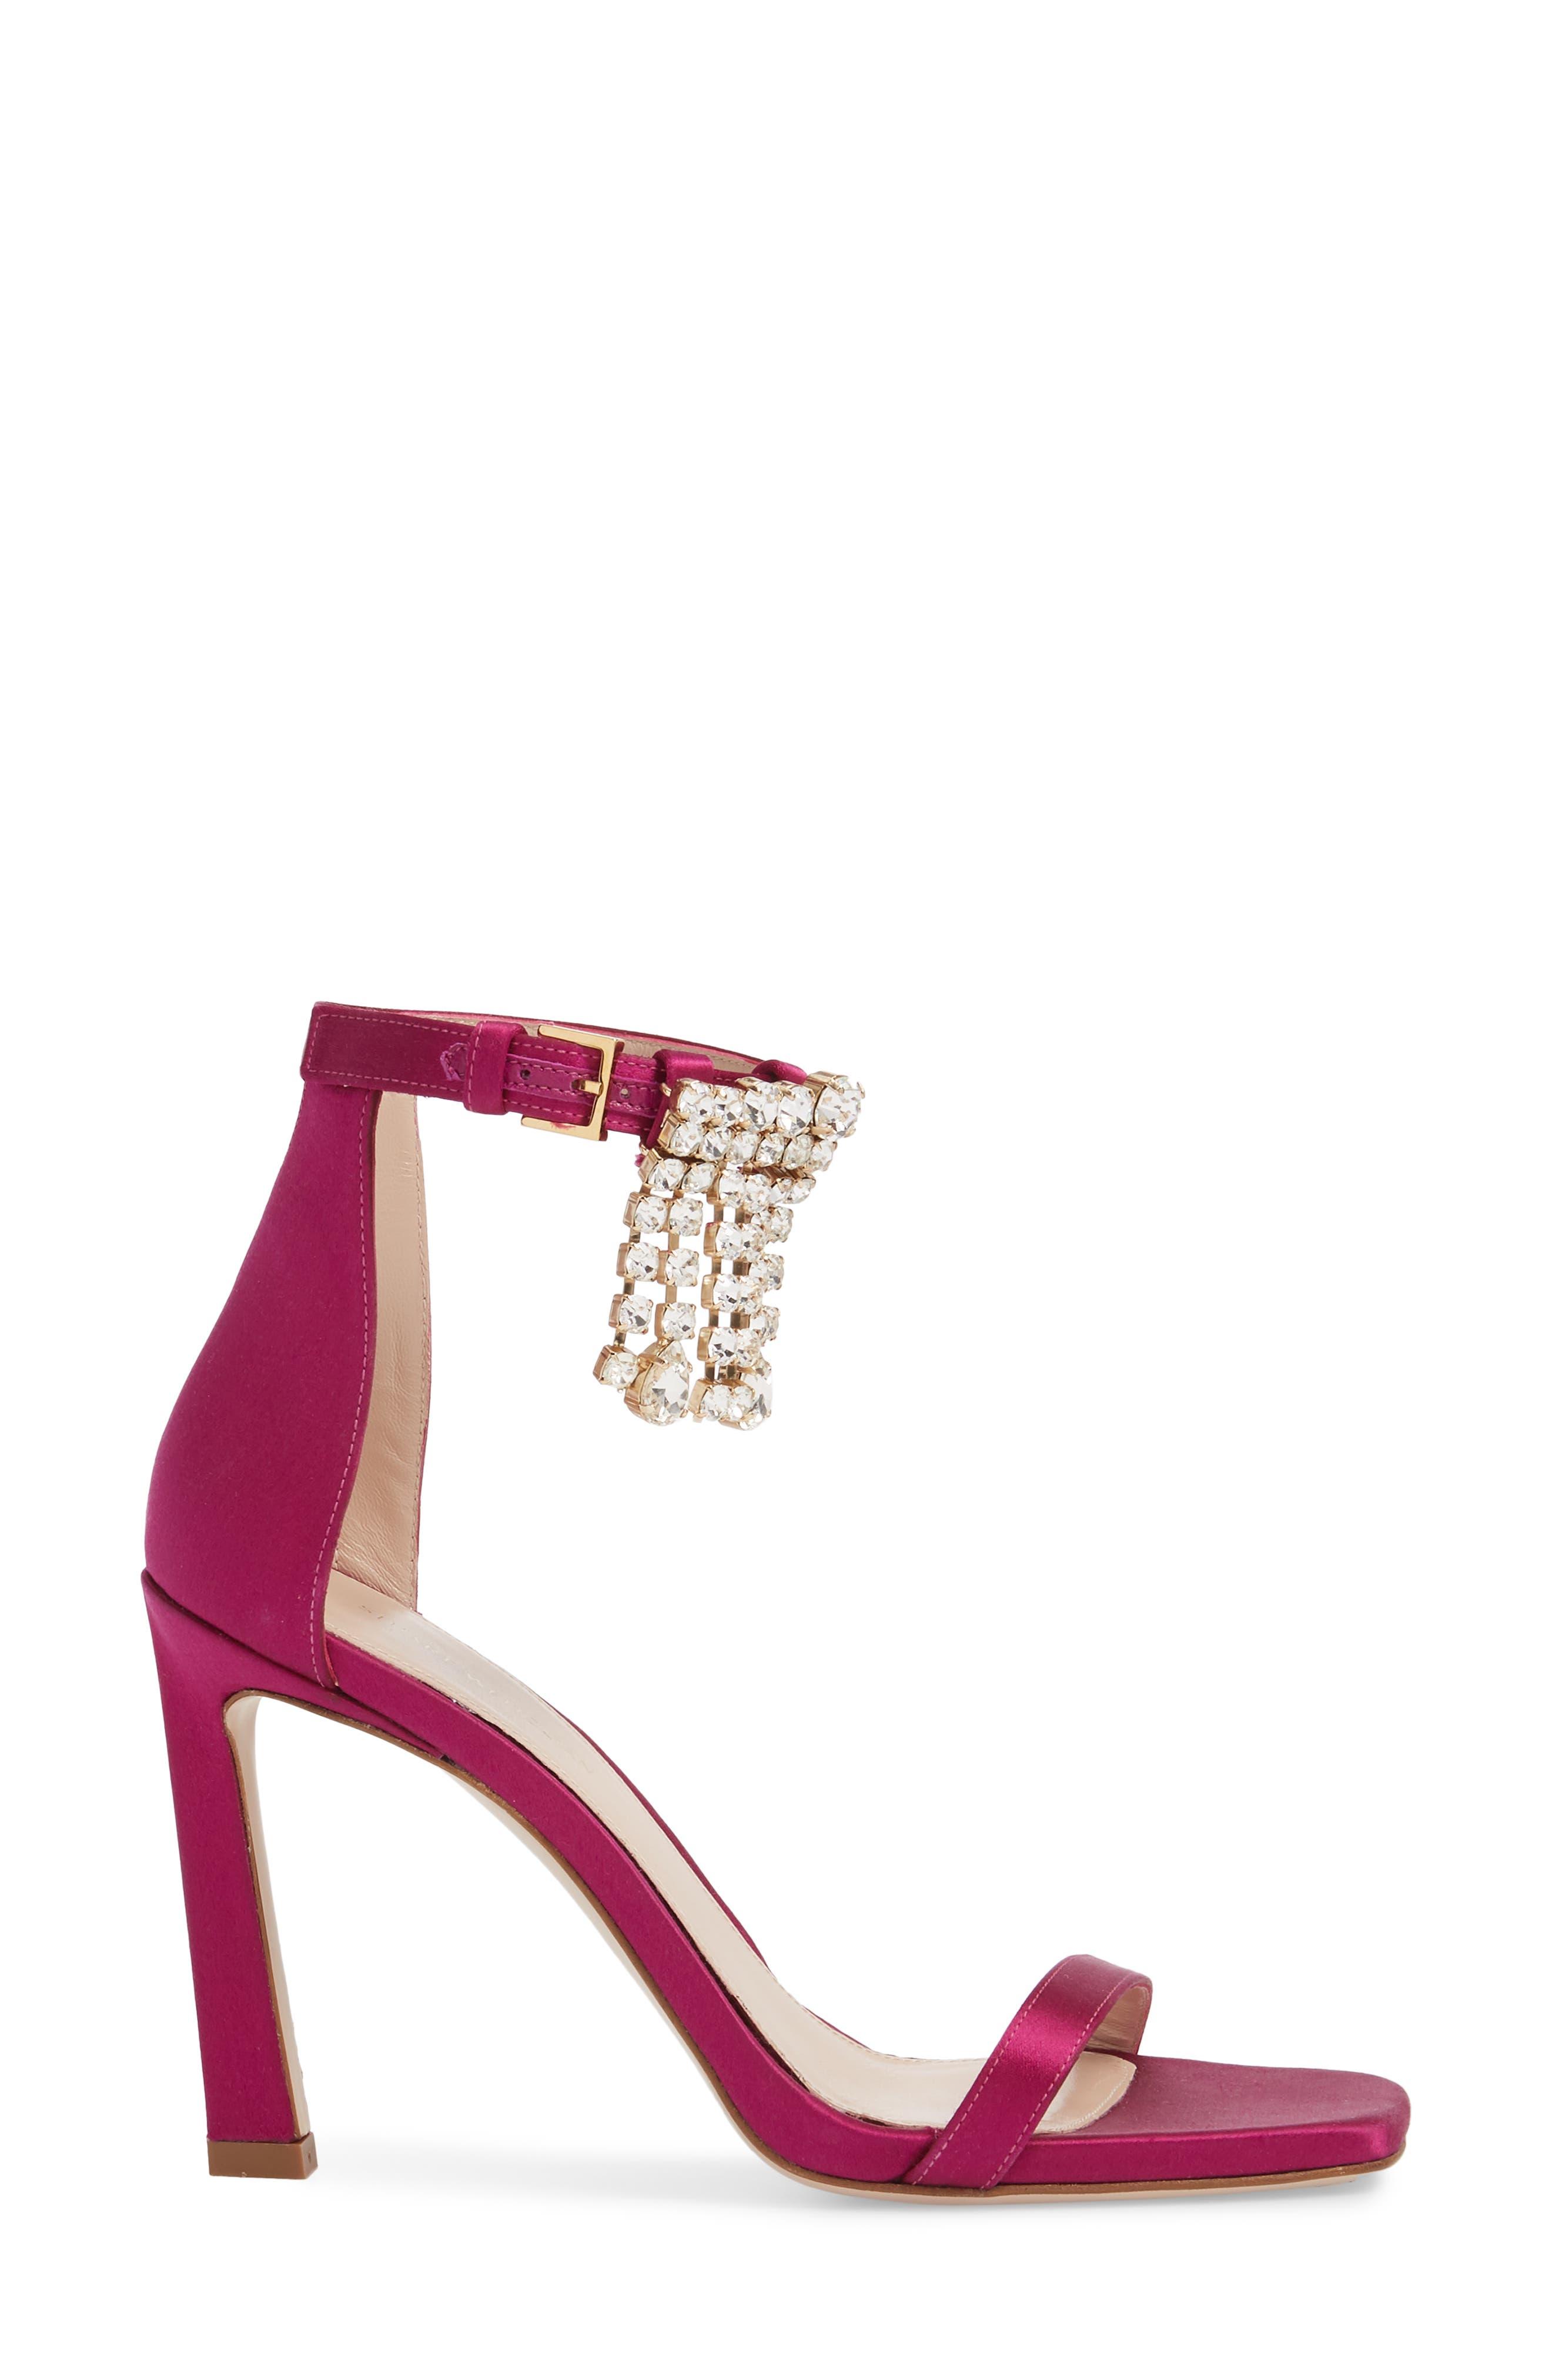 100FRINGESQUARENUDIST Sandal,                             Alternate thumbnail 3, color,                             Grape Silk Satin